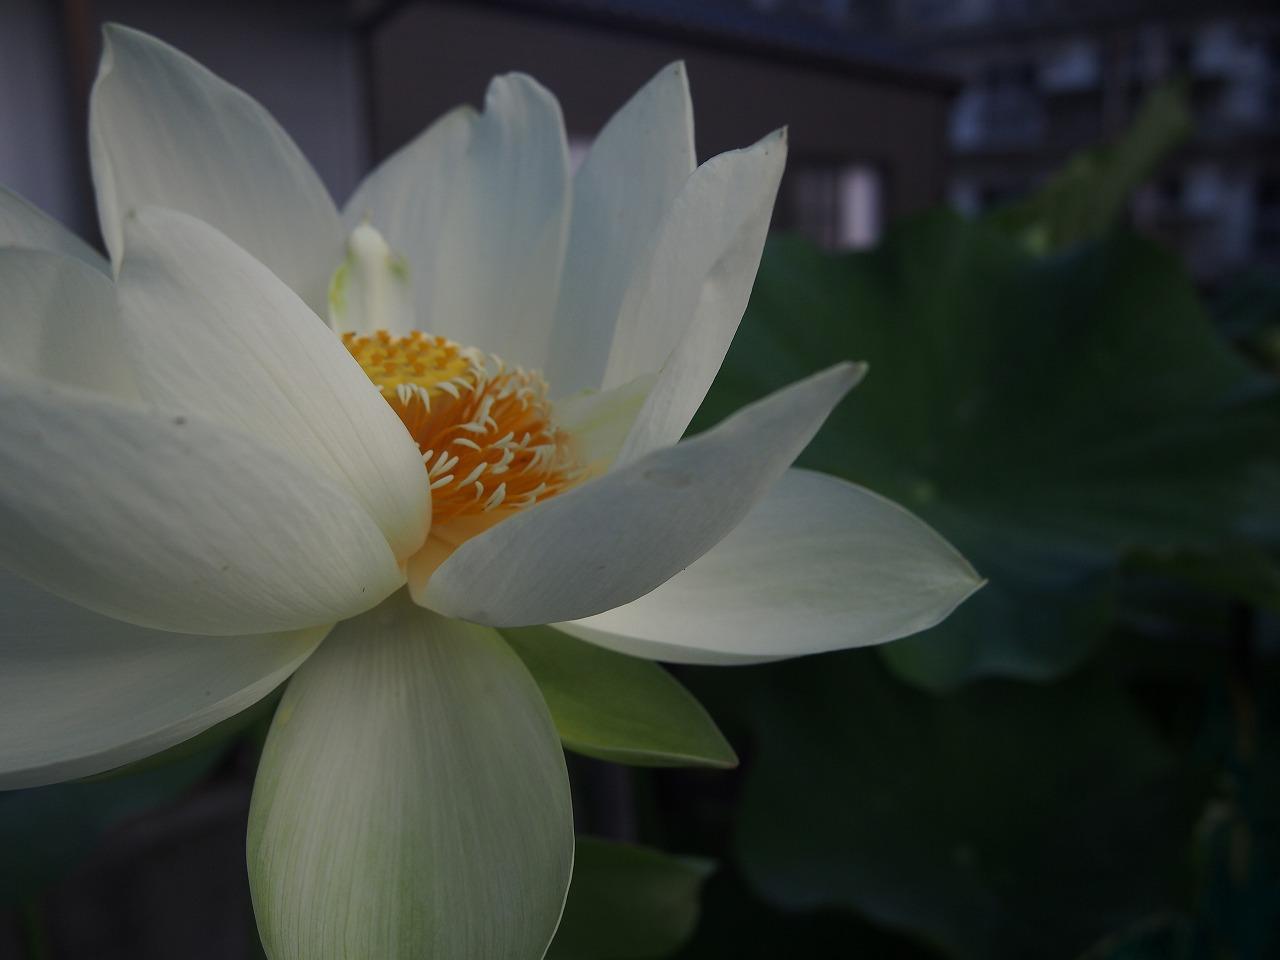 20170705-Lotus_Kougyokuhai2-O02.jpg